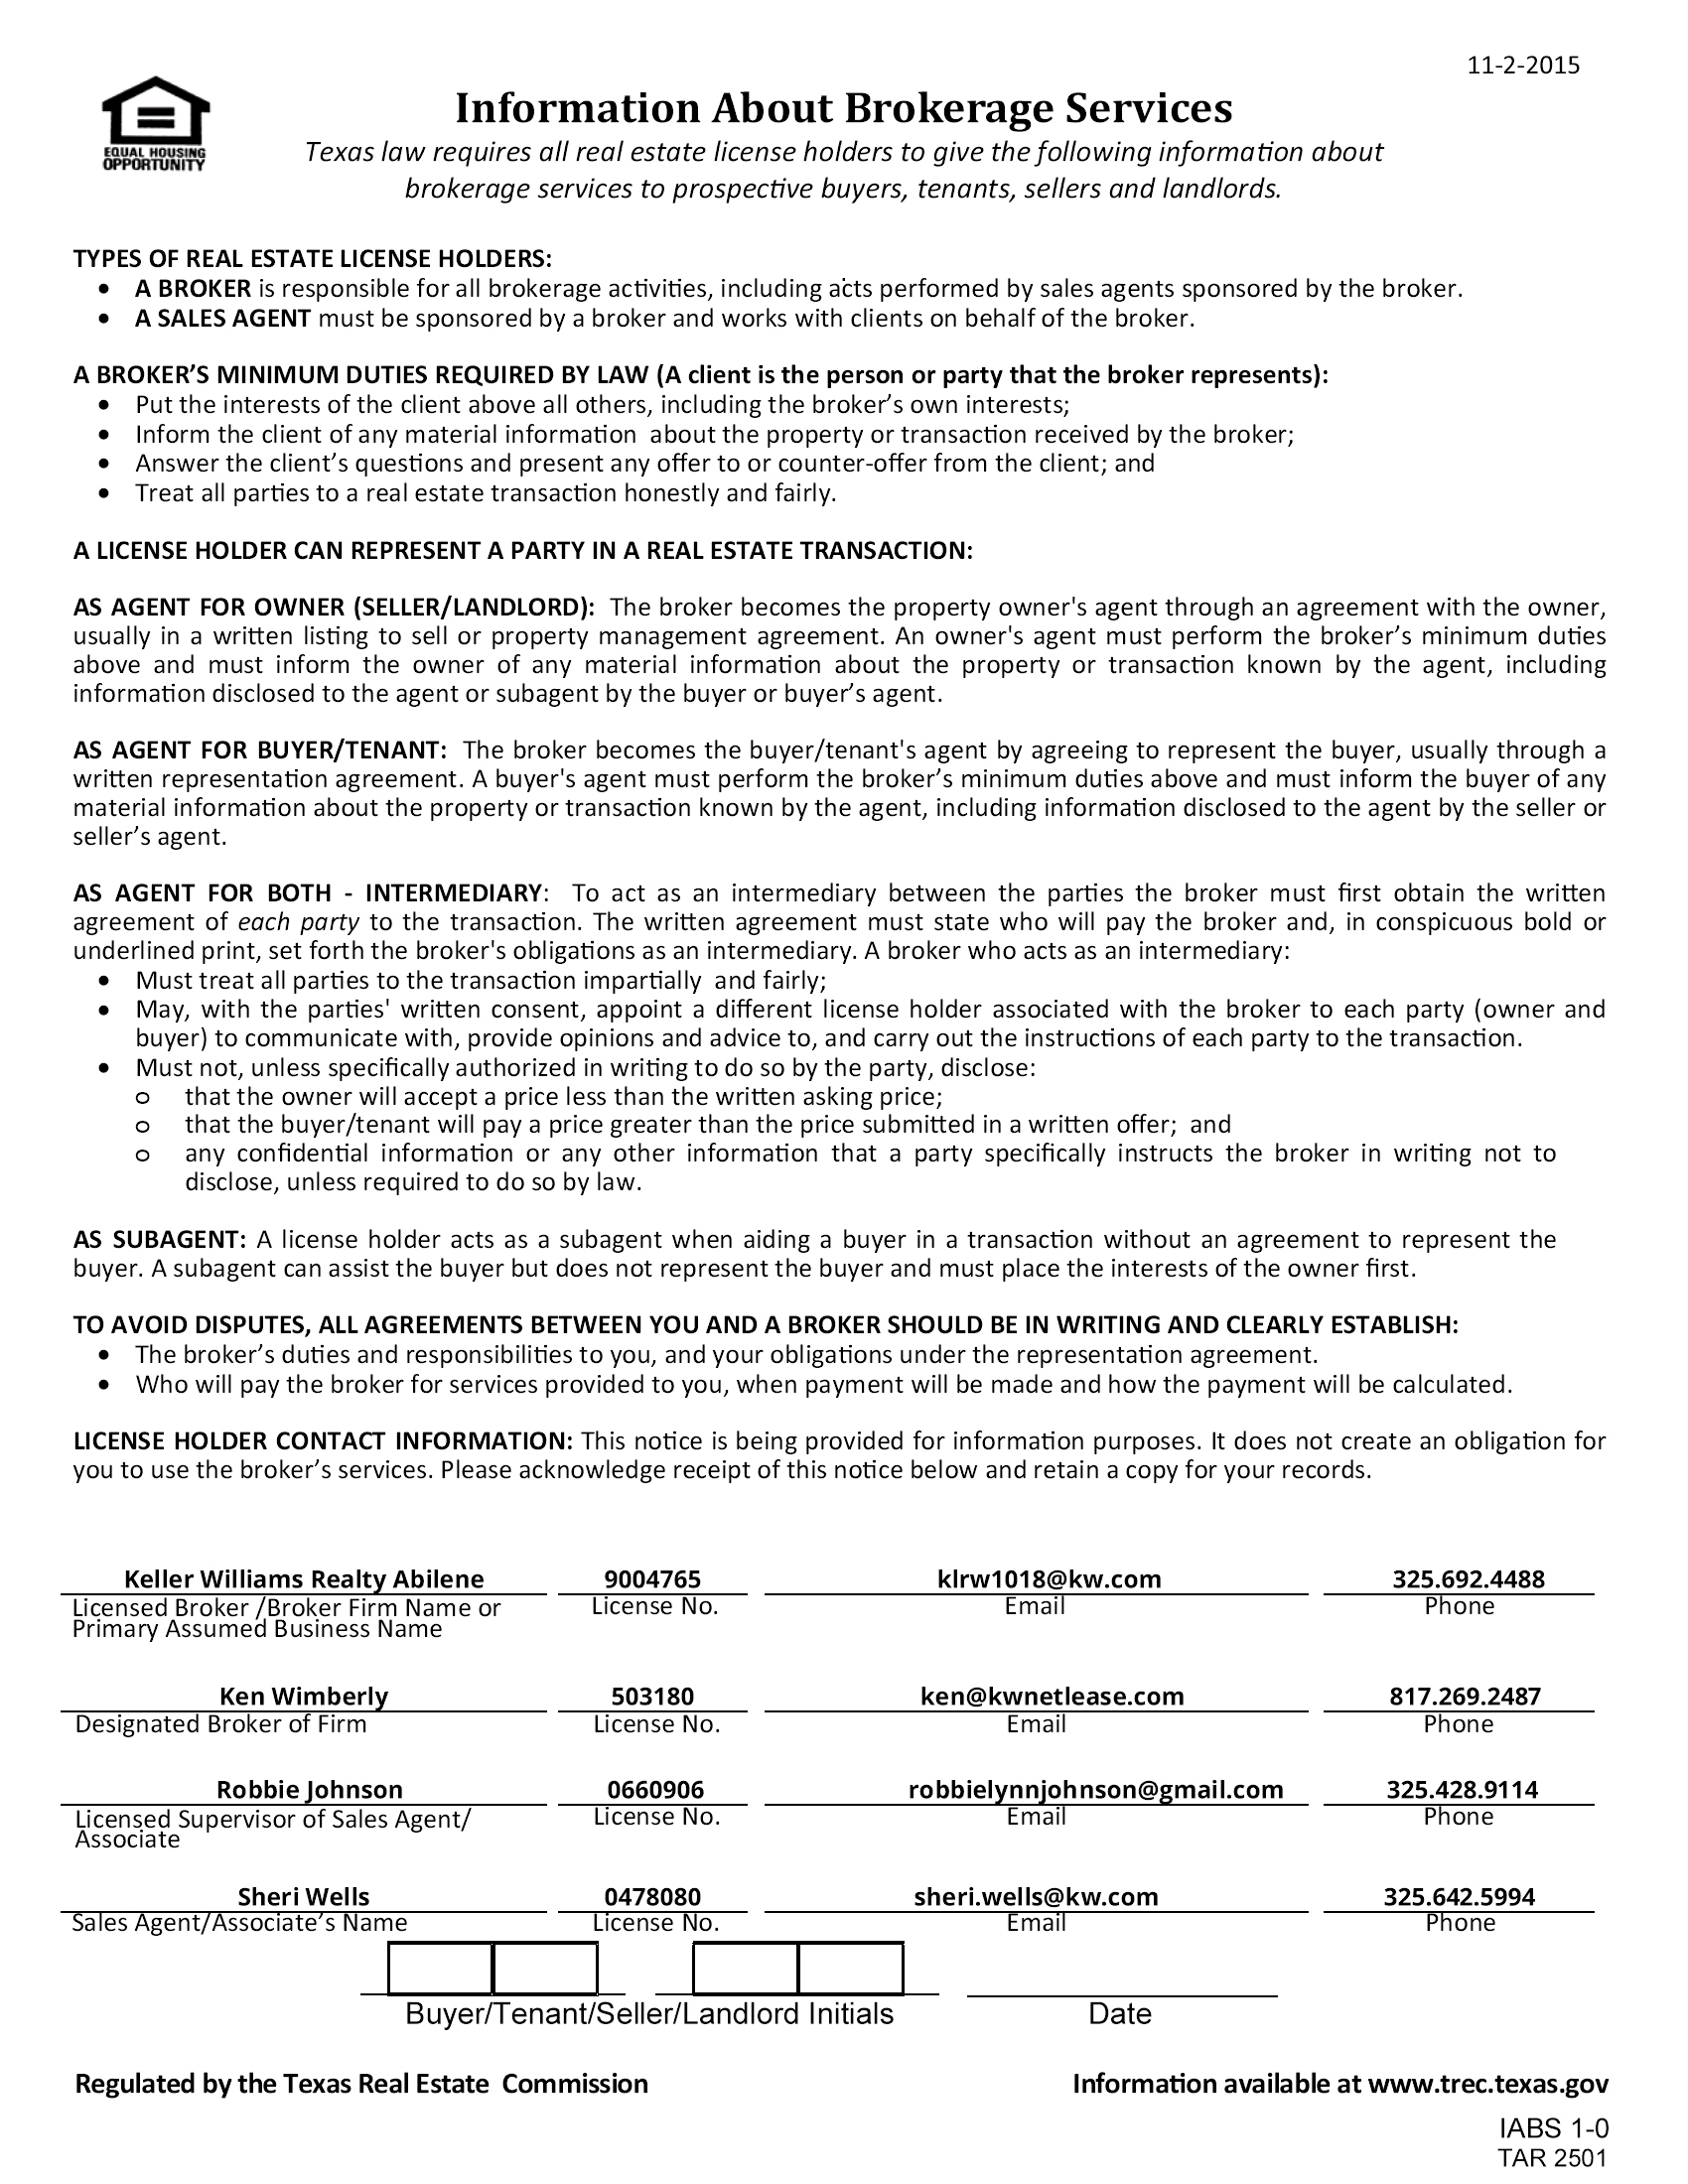 TREC Information About Brokerage ServicesThe Wells Team